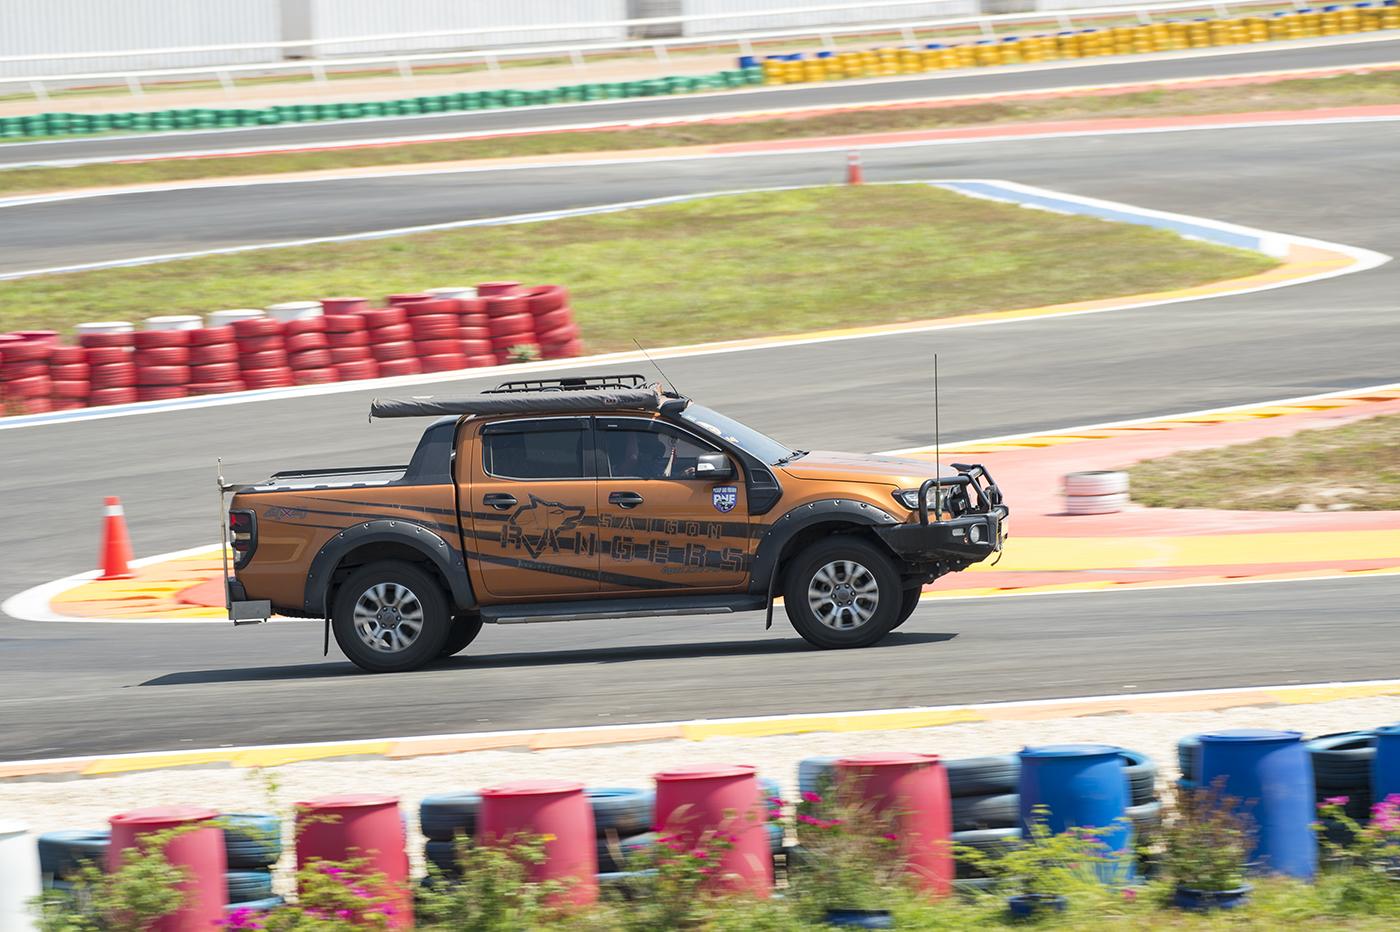 rheinol-racing-days-autodaily-0-11.jpg